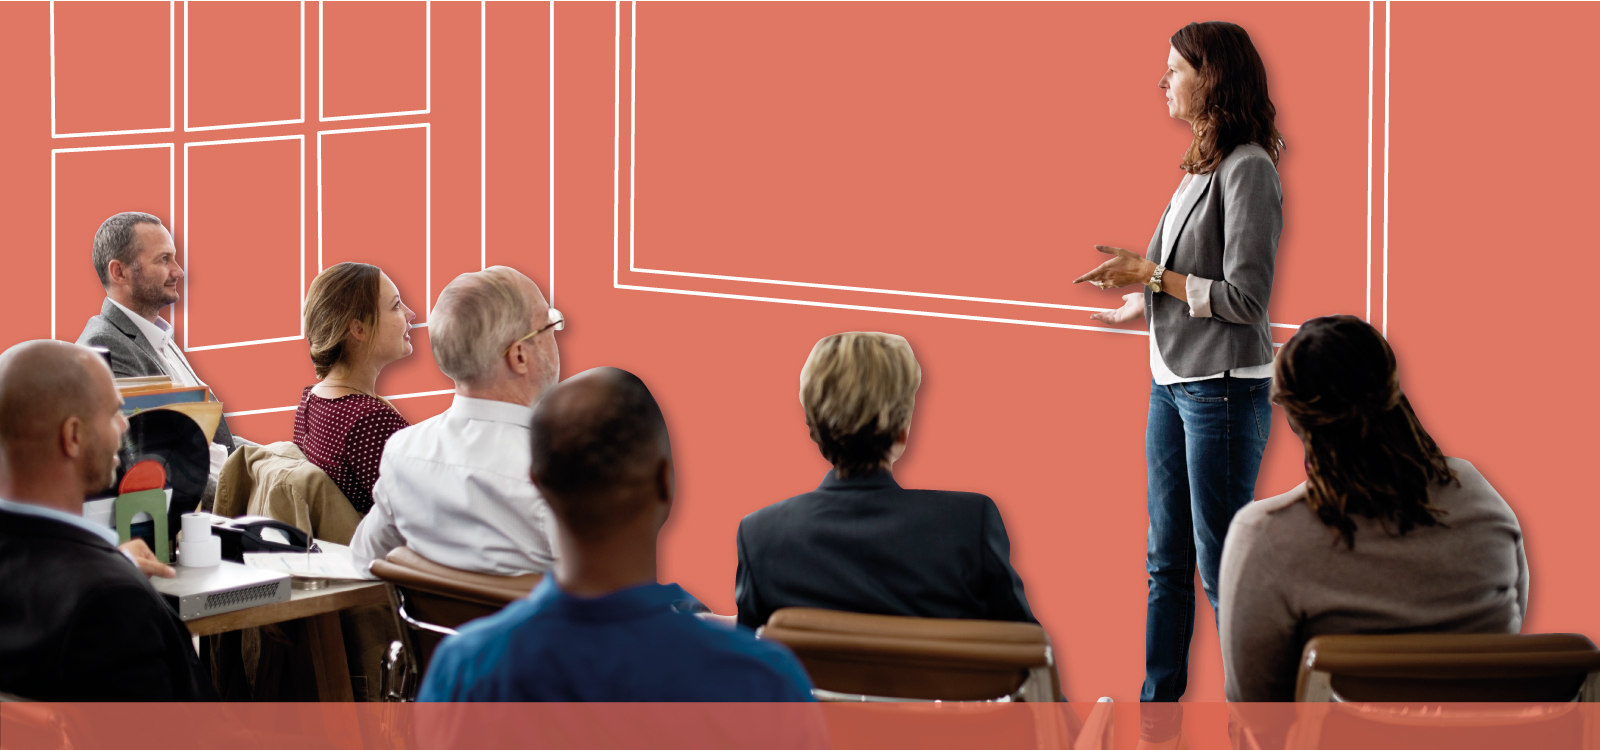 esa-Slide2-CoachingSistemico